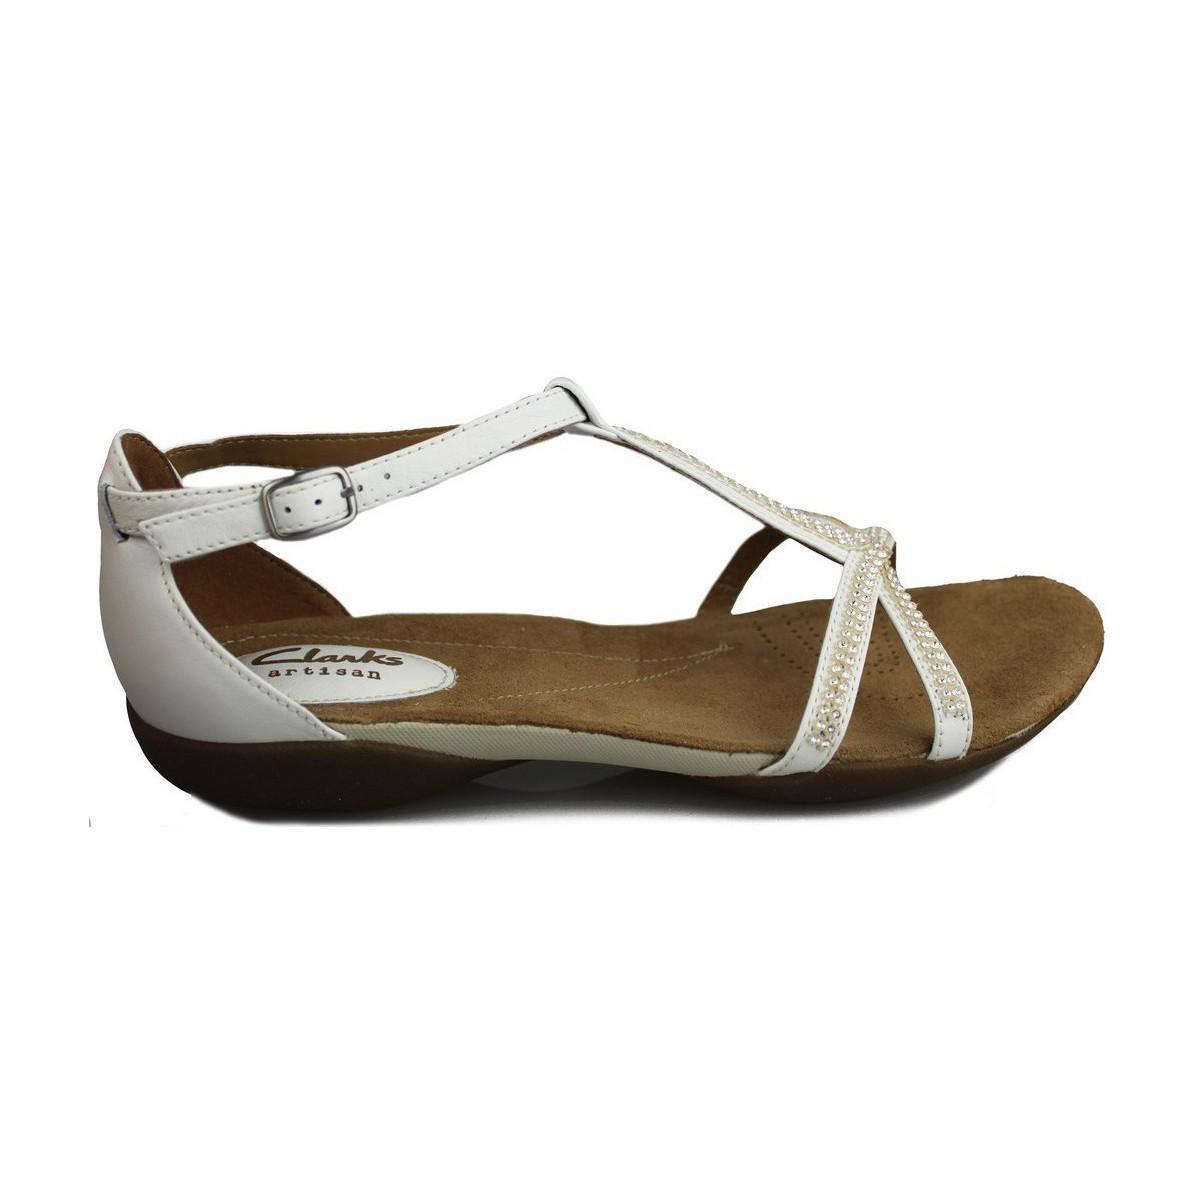 0a81e2512 Clarks Raffi Star Women s Sandals In White in White - Lyst